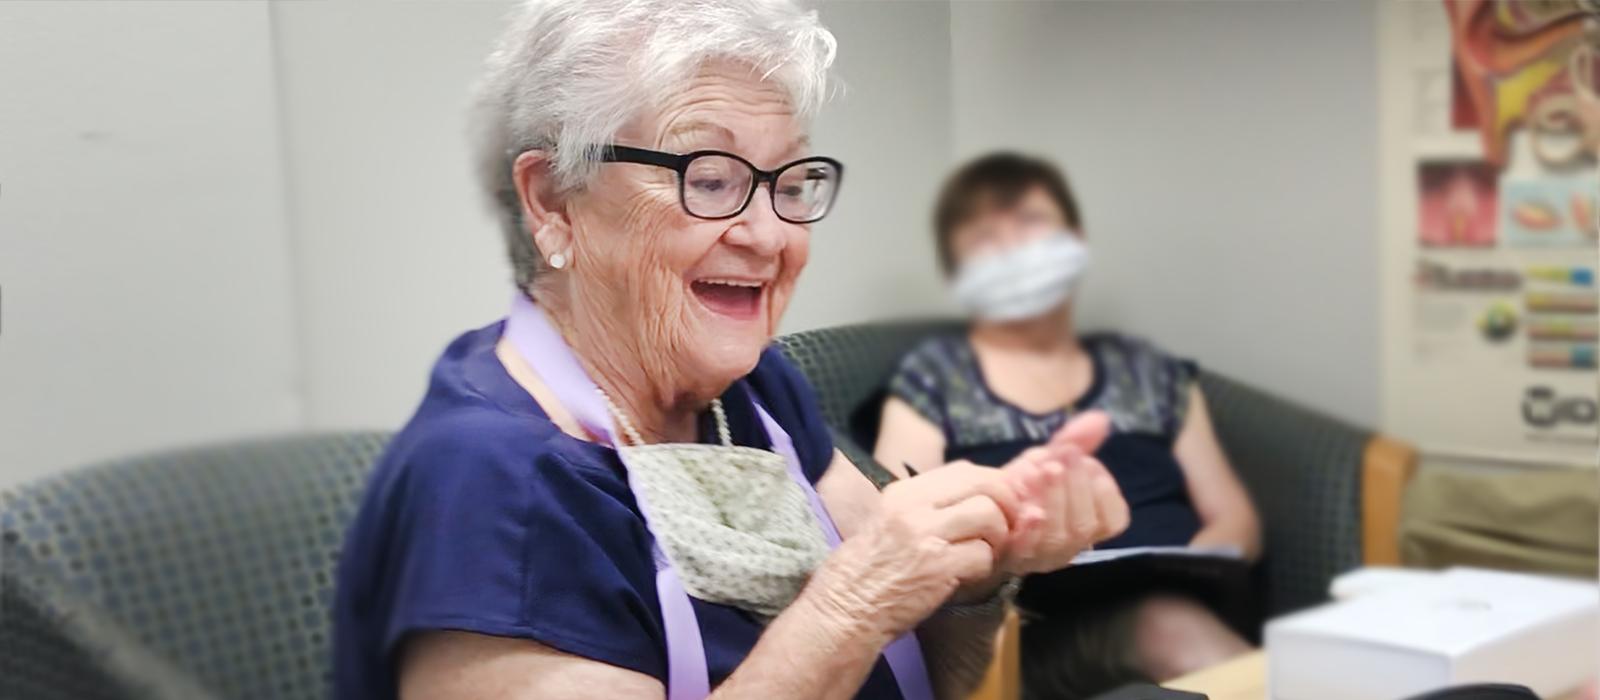 woman hearing aid happy - box header